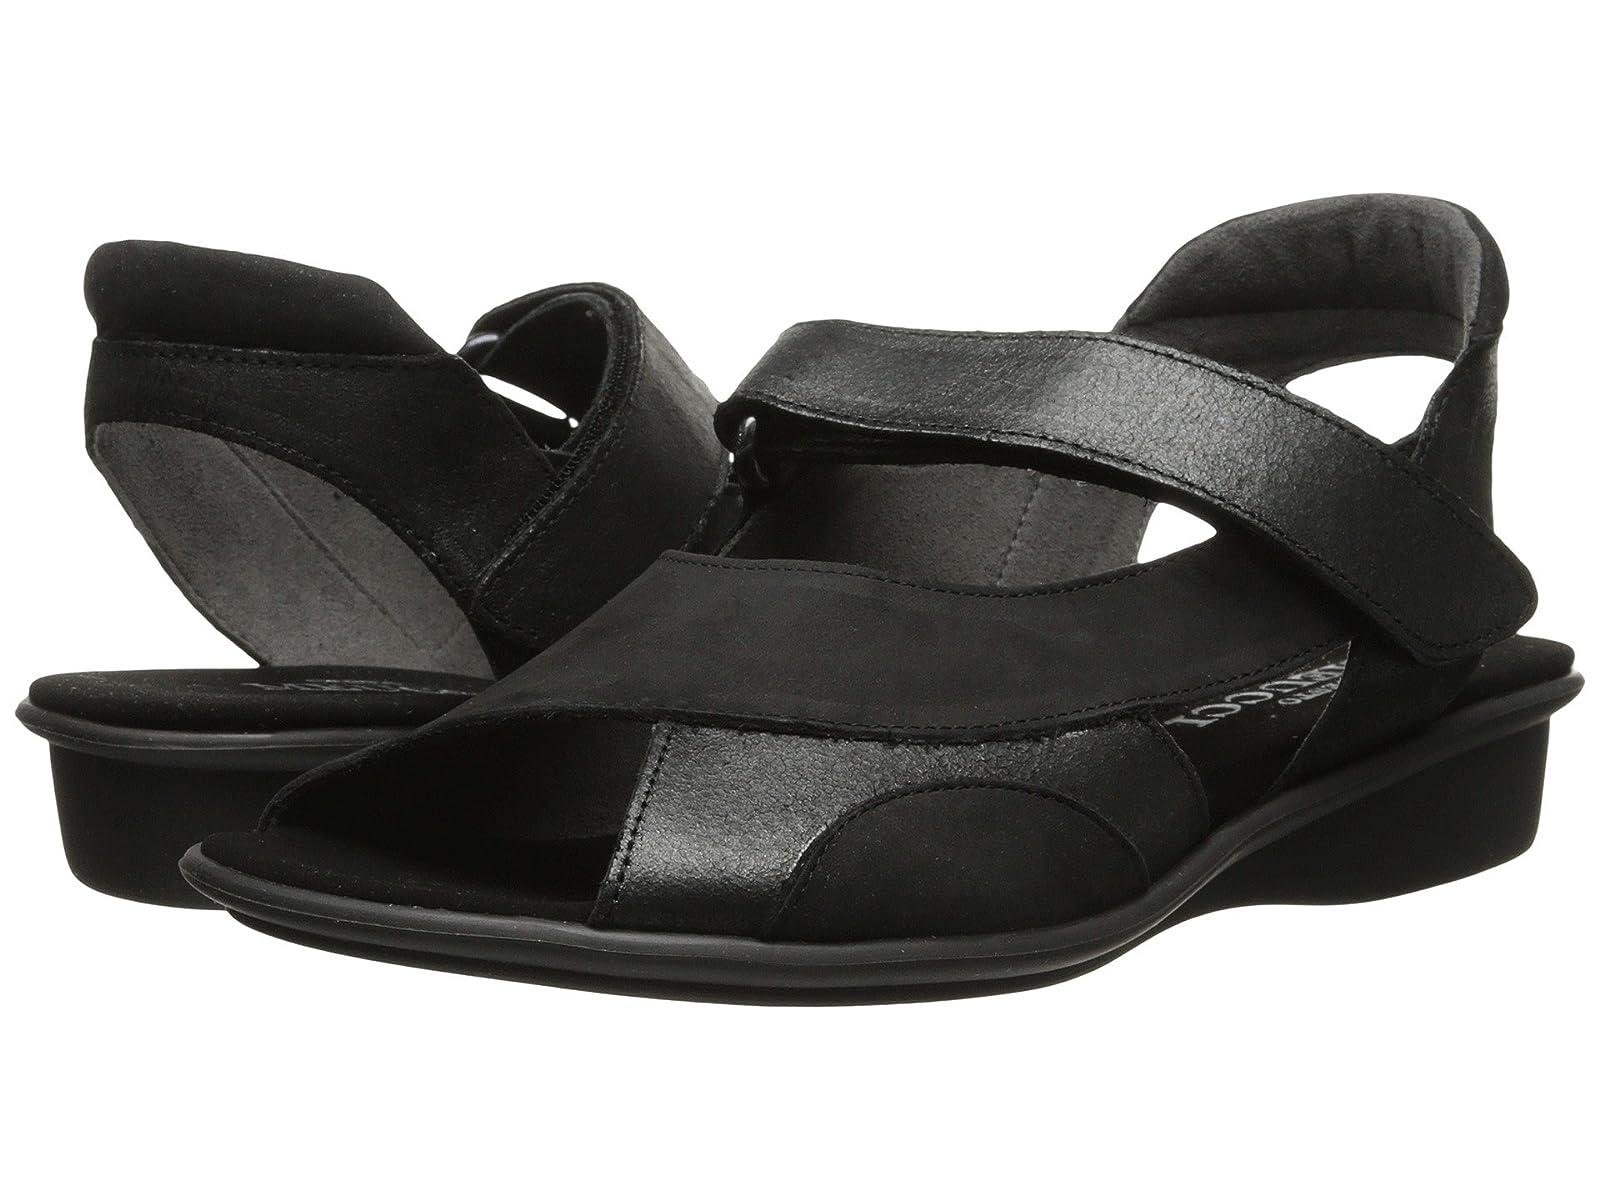 Sesto Meucci EdreaCheap and distinctive eye-catching shoes